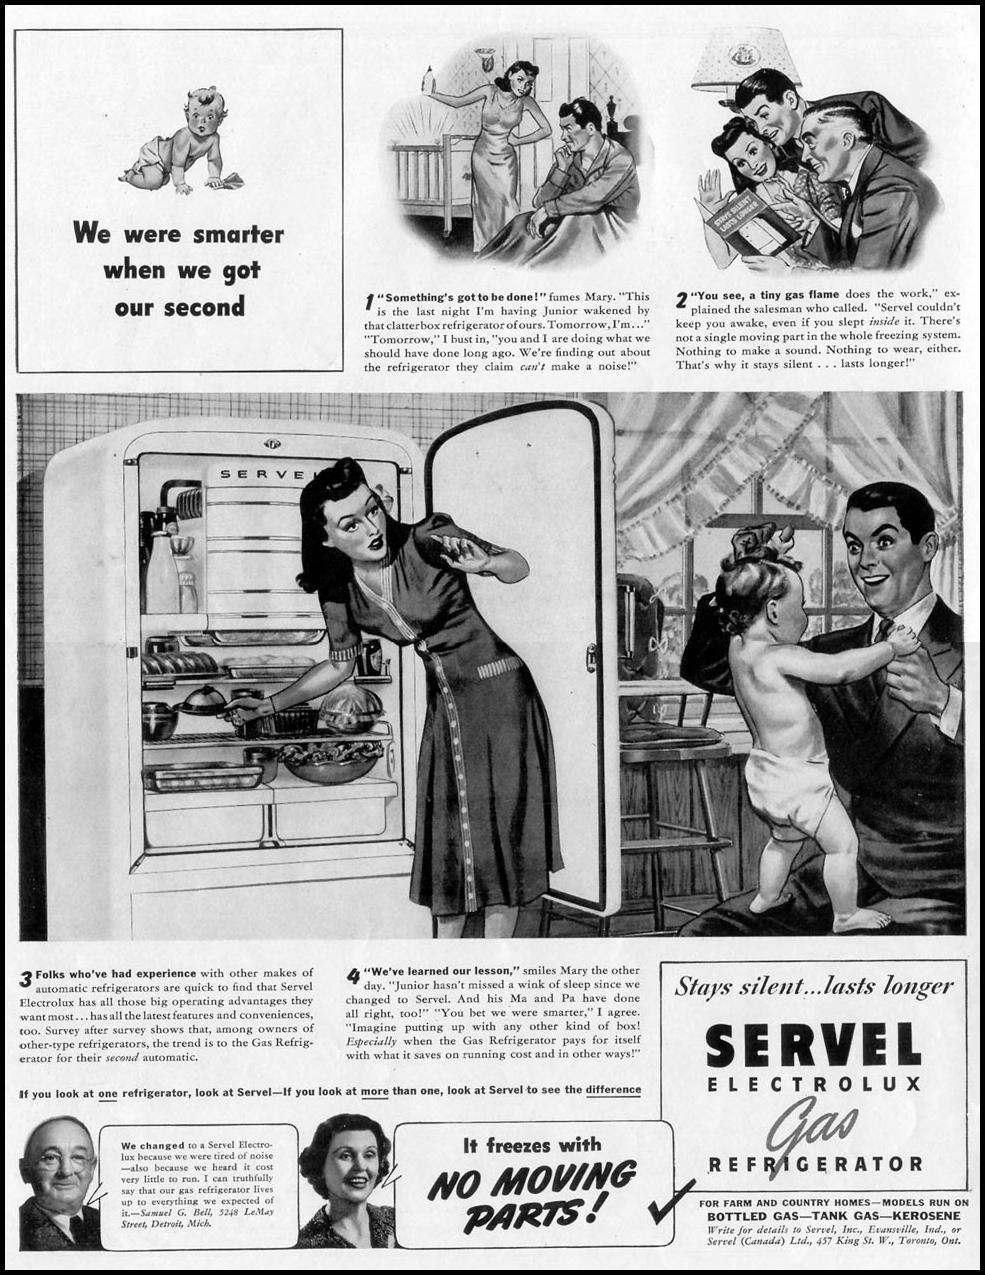 SERVEL ELECTROLUX GAS REFRIGERATORS LIFE 06/23/1941 p. 12